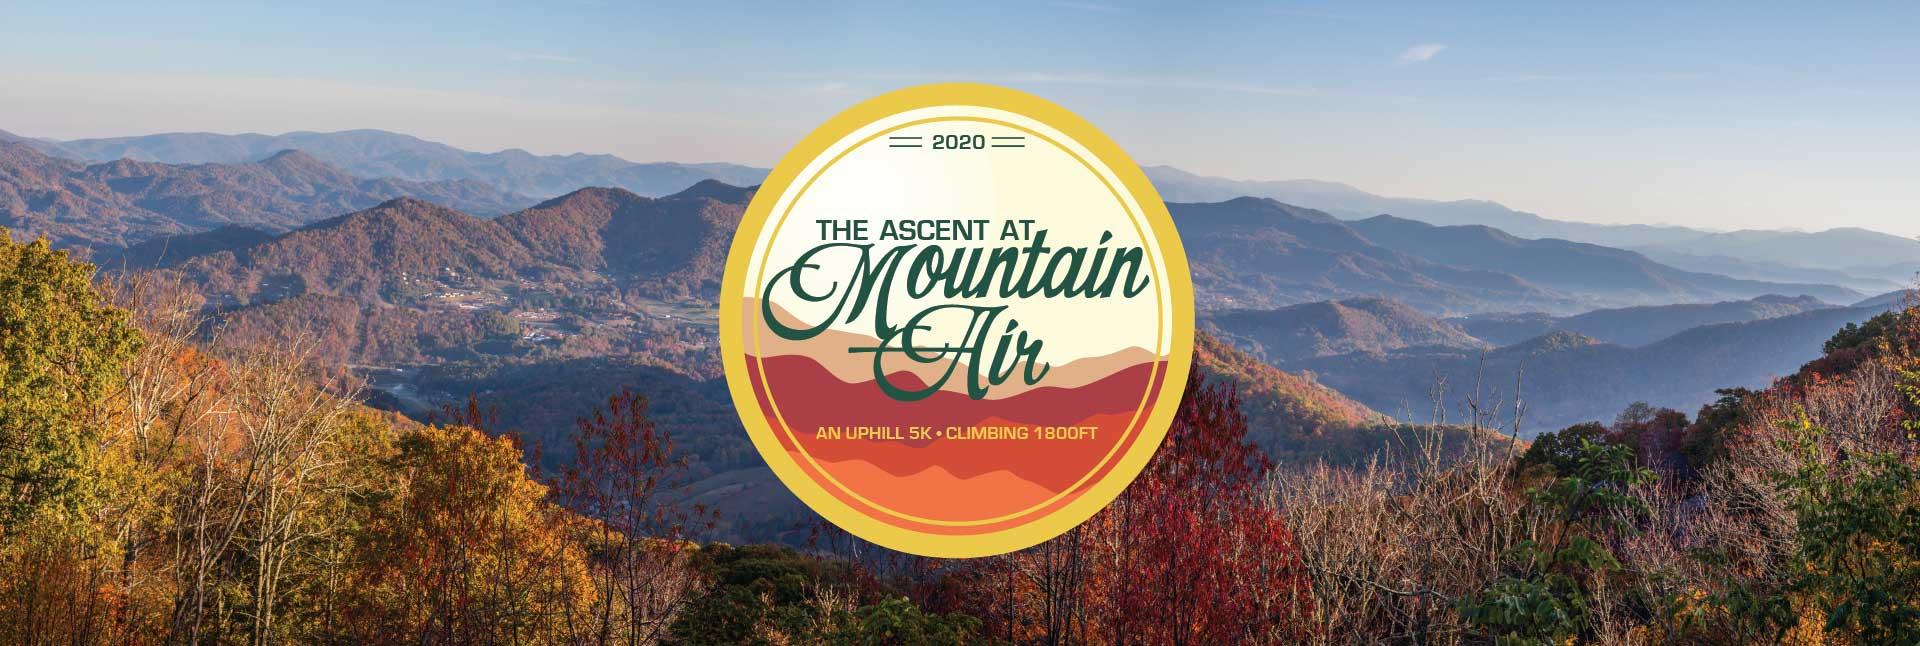 Ascent At Mountain Air 5K